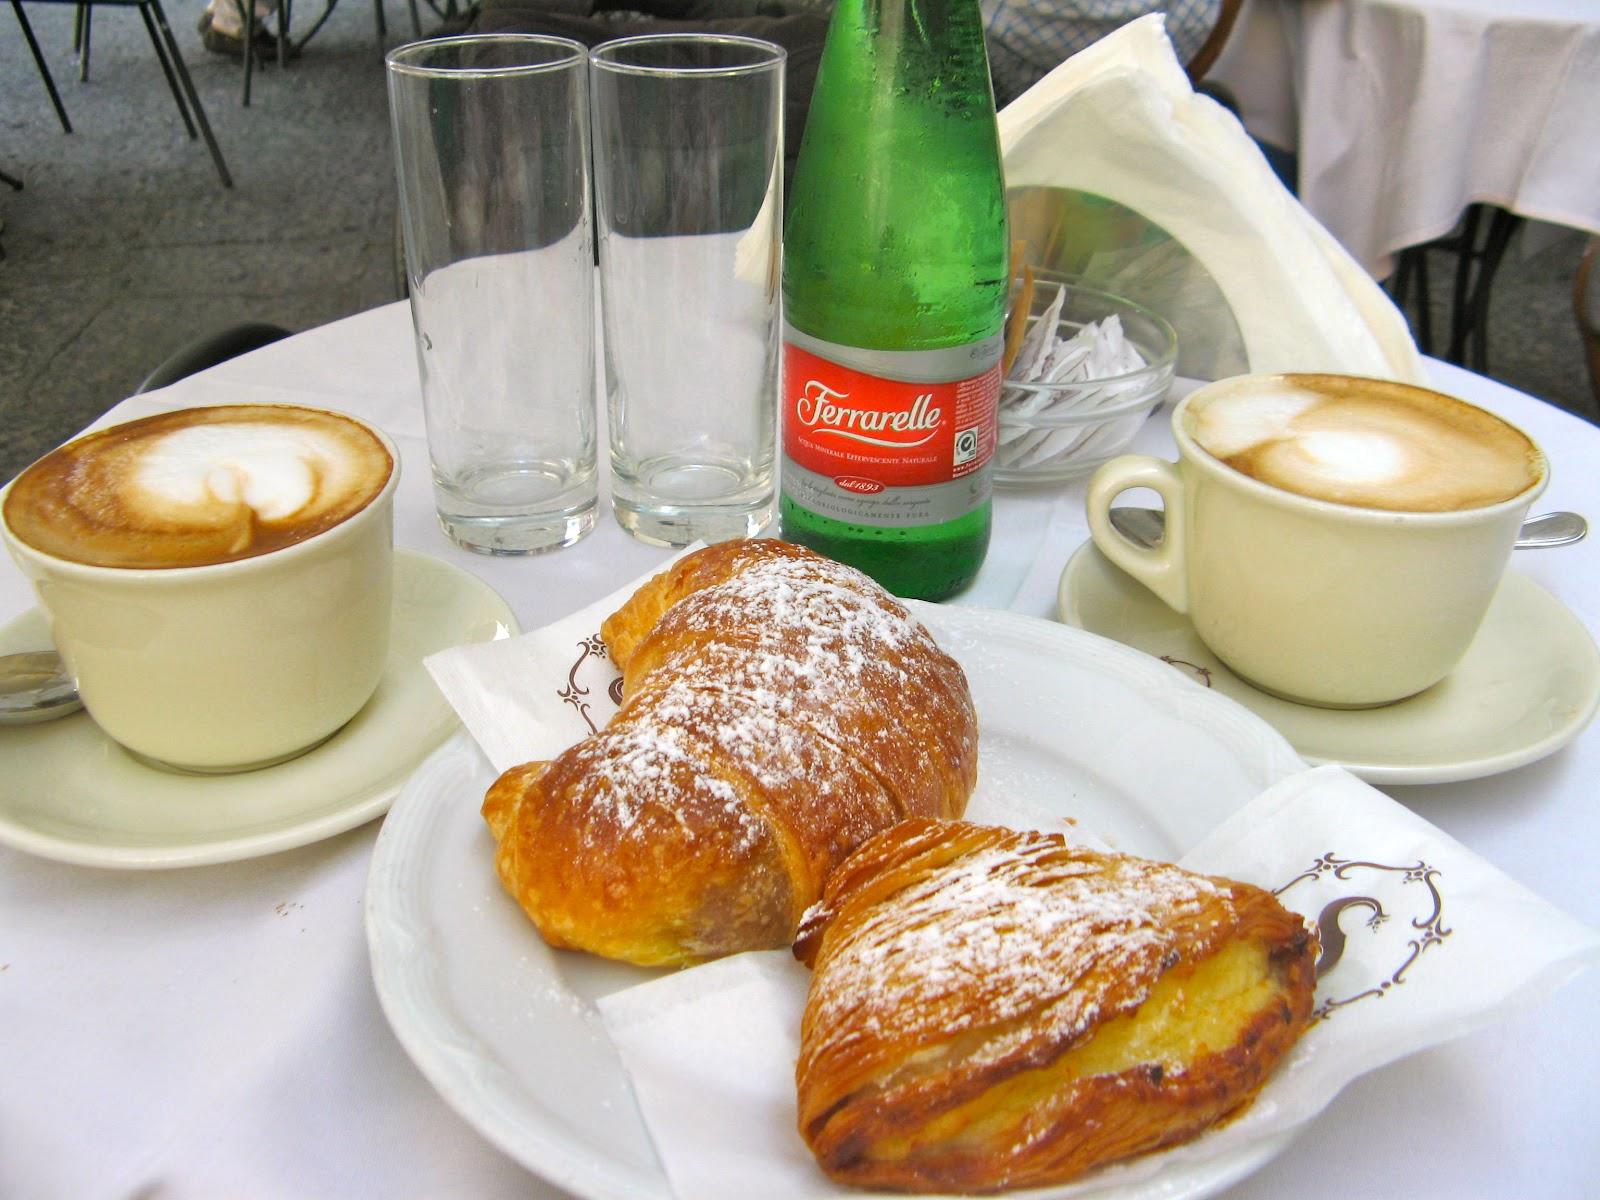 Breakfast in italy saluto italia the italian way for Italian breakfast